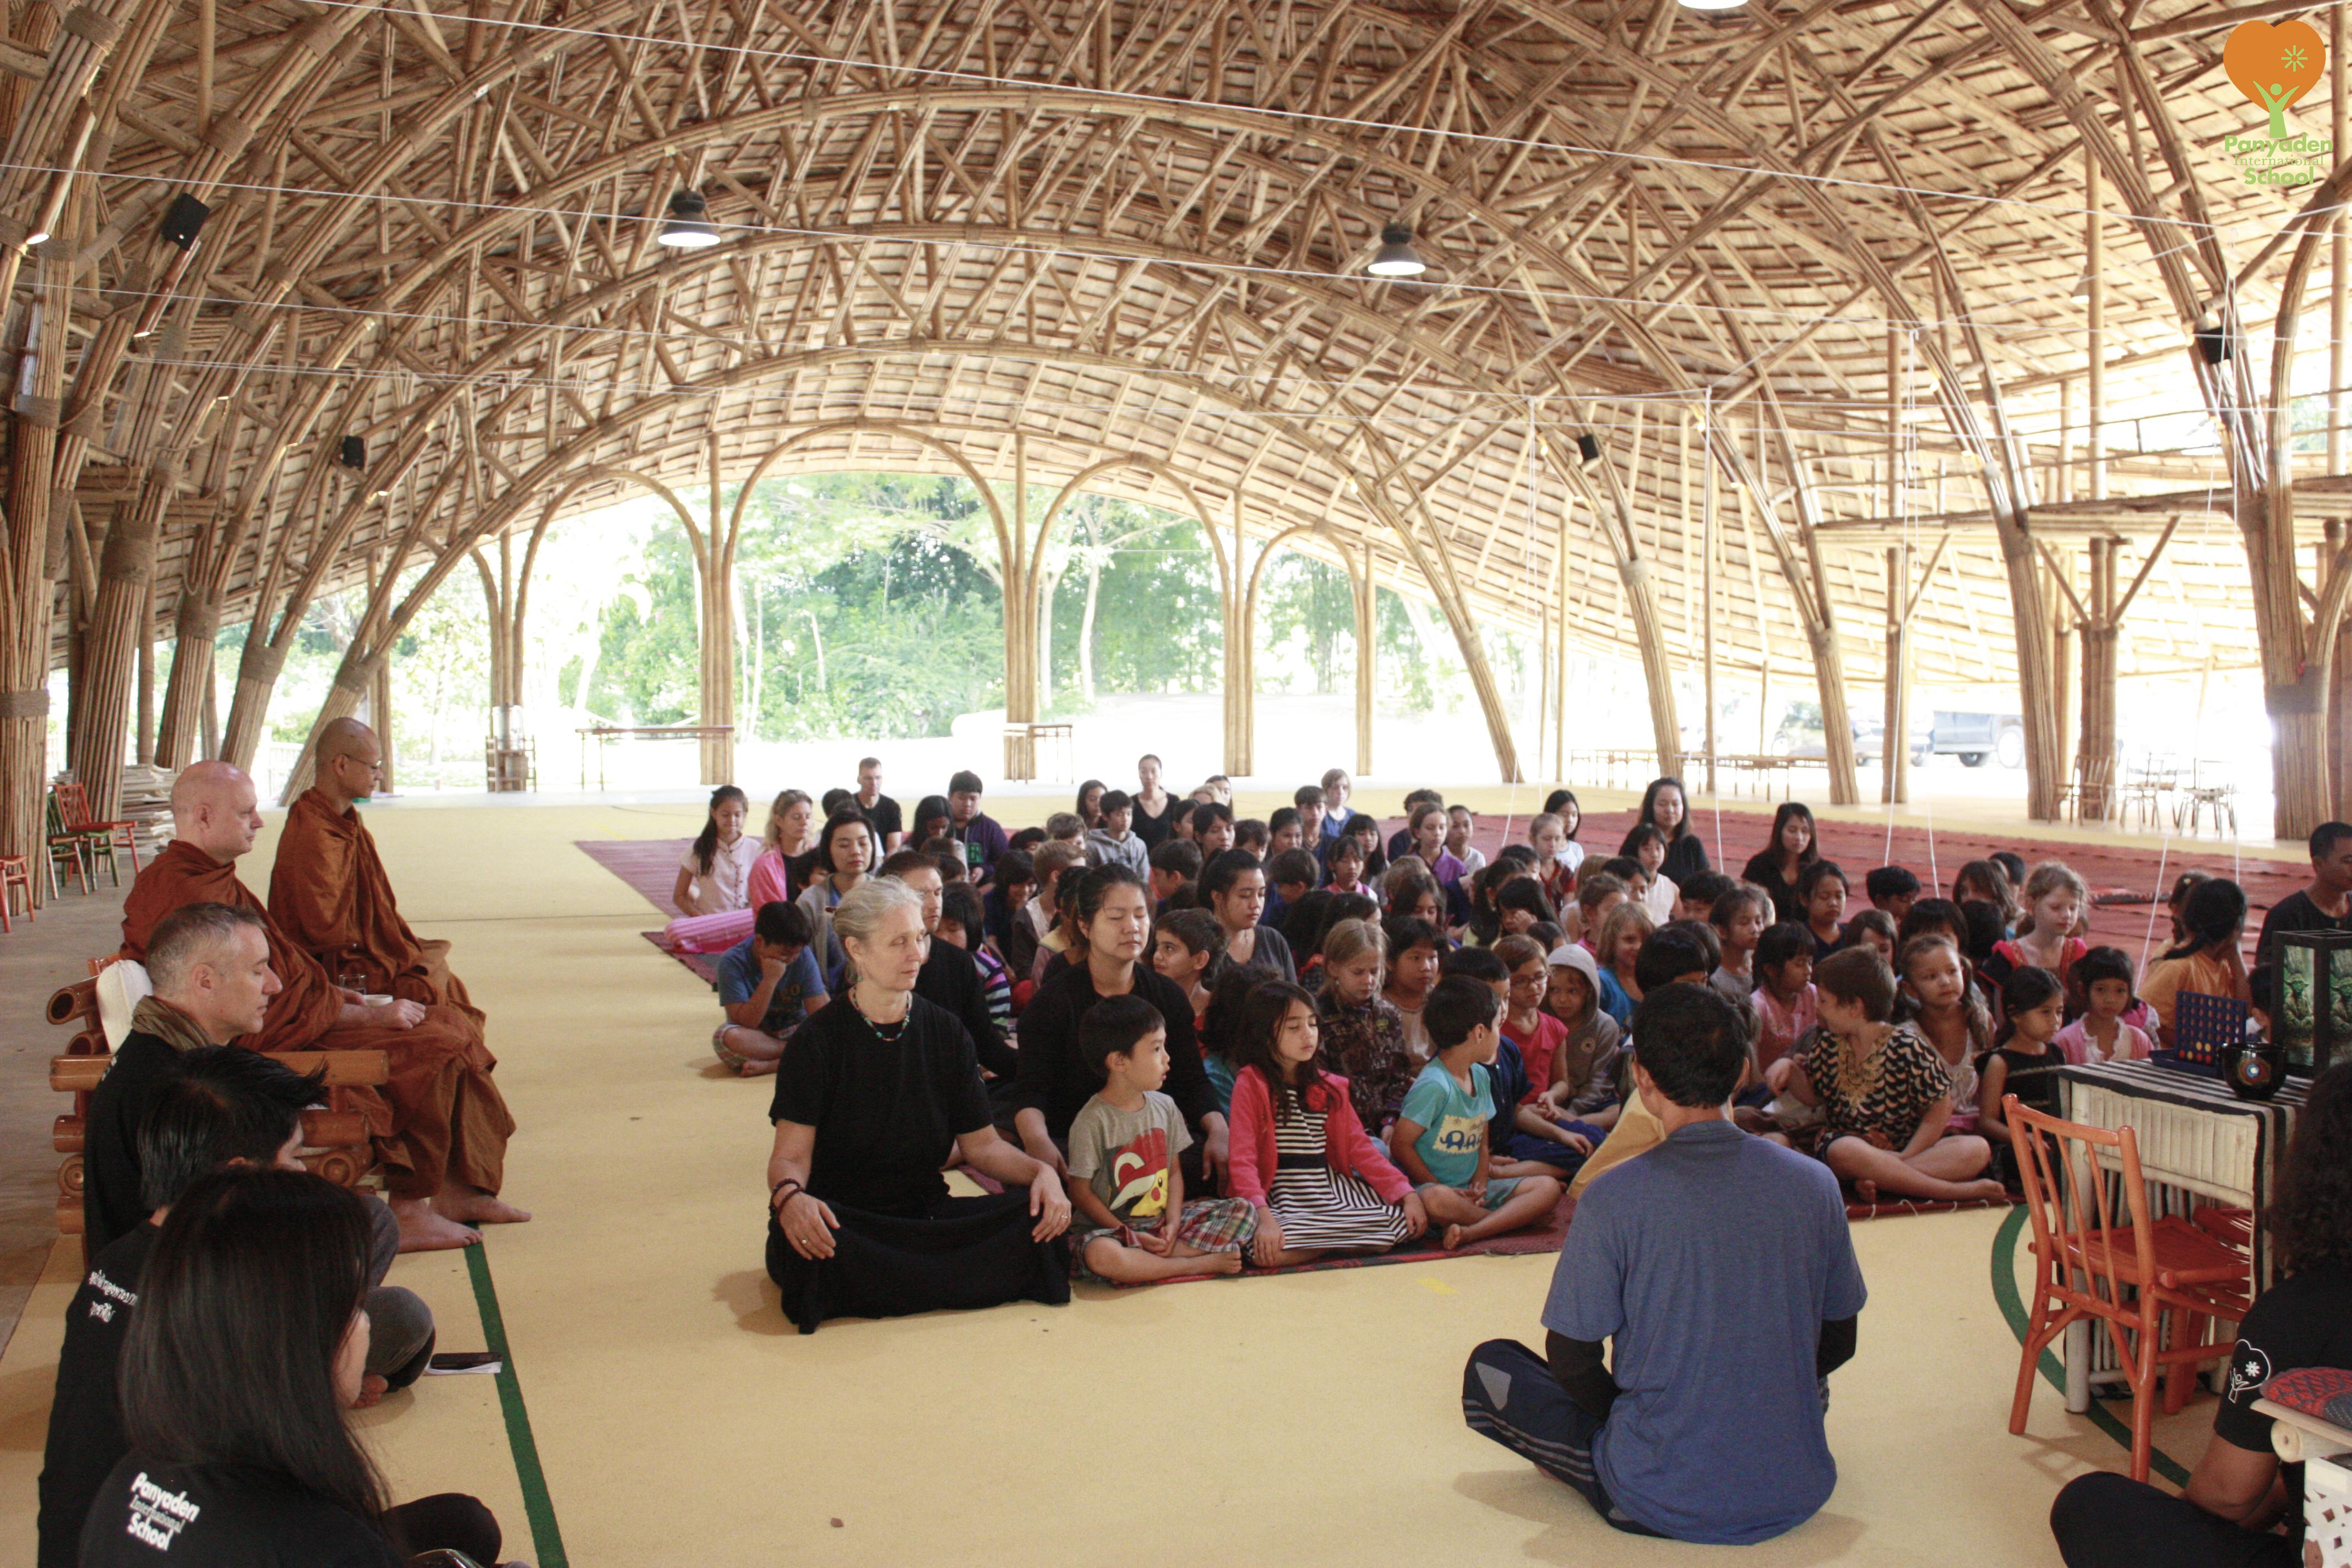 Ven. Ajahn Jayasaro and Ven. Ajahn Jiew observe Panyaden International School wise habit session